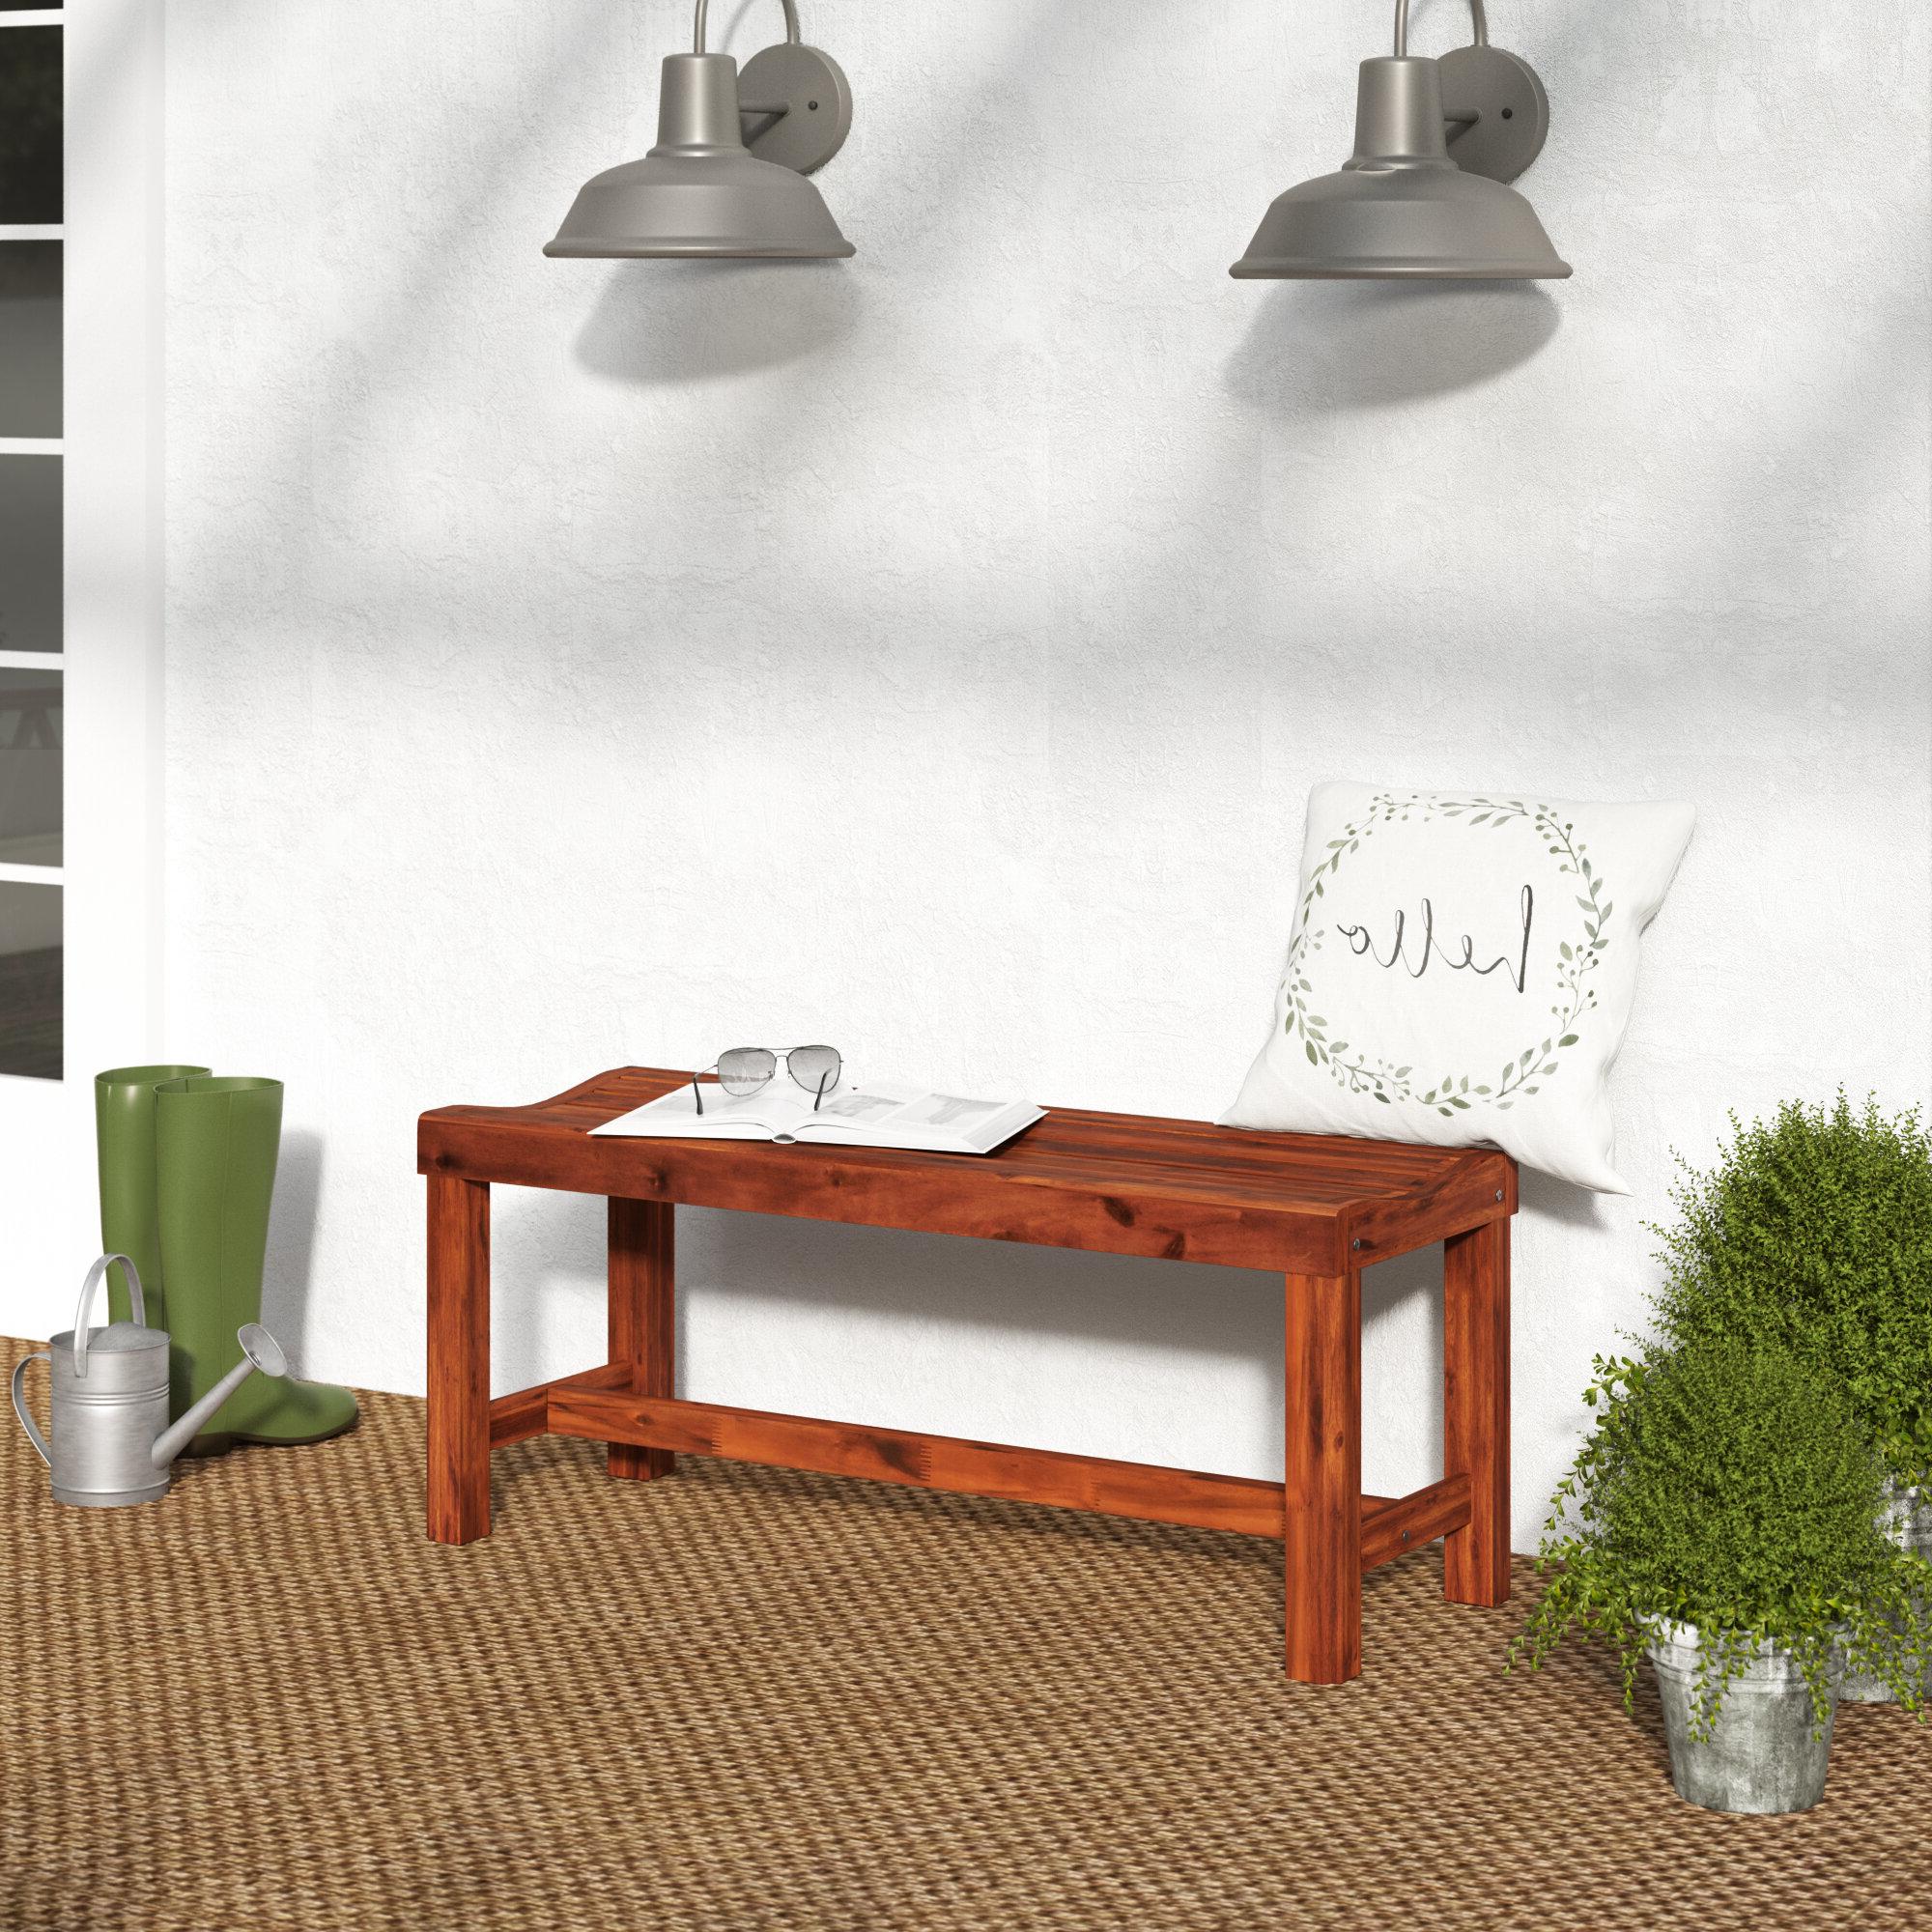 Gabbert Wooden Garden Bench With Regard To Fashionable Gabbert Wooden Garden Benches (View 4 of 30)